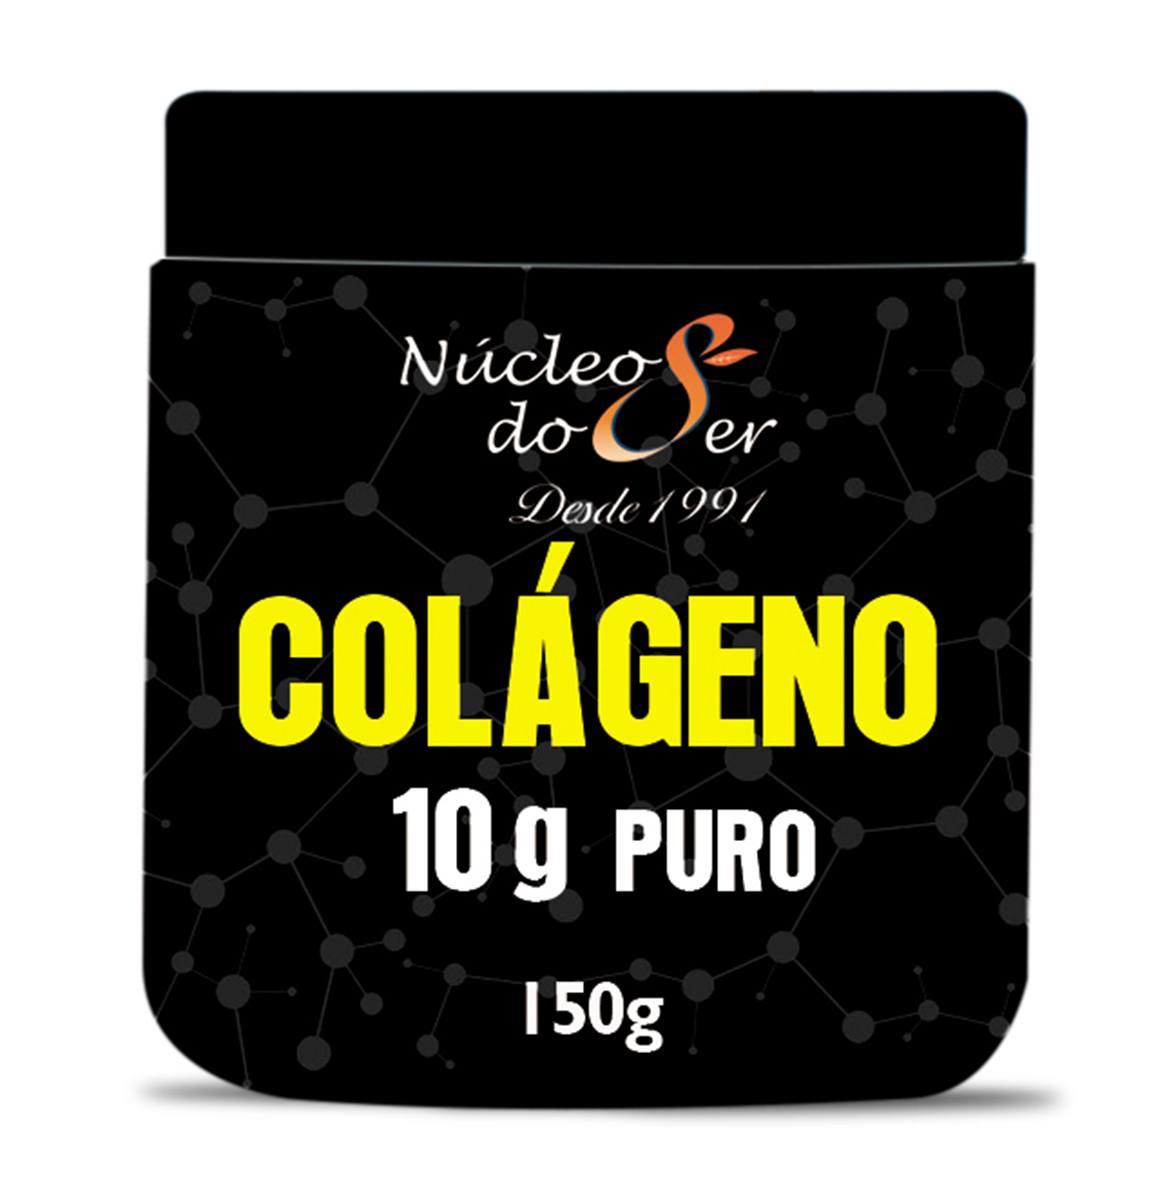 Colágeno  10g Puro - 150g<br>Beleza e Estética - R$ 60,00